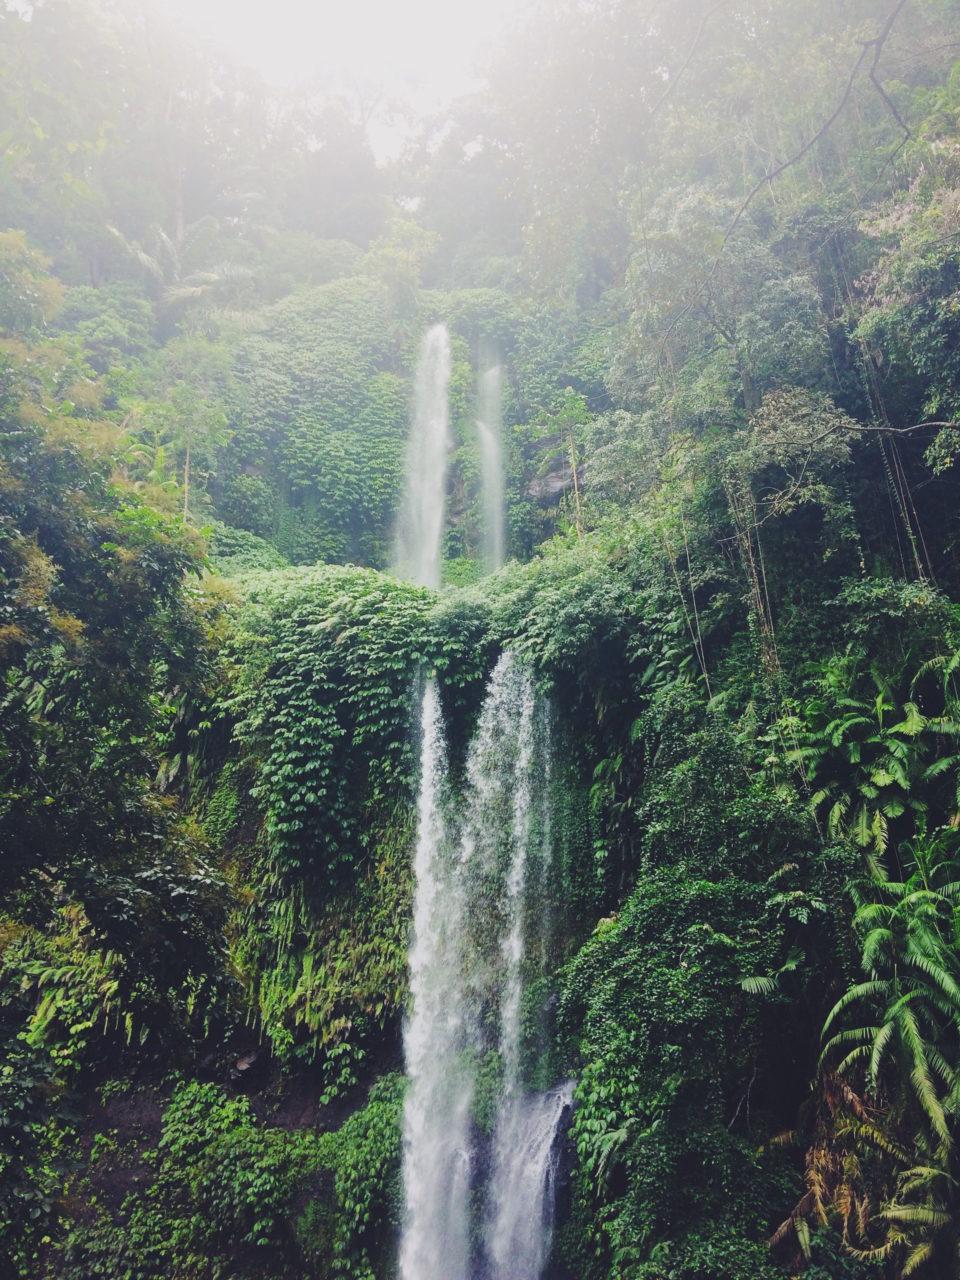 Travellers Insight Reiseblog Lombok Wasserfall Sendang Gile